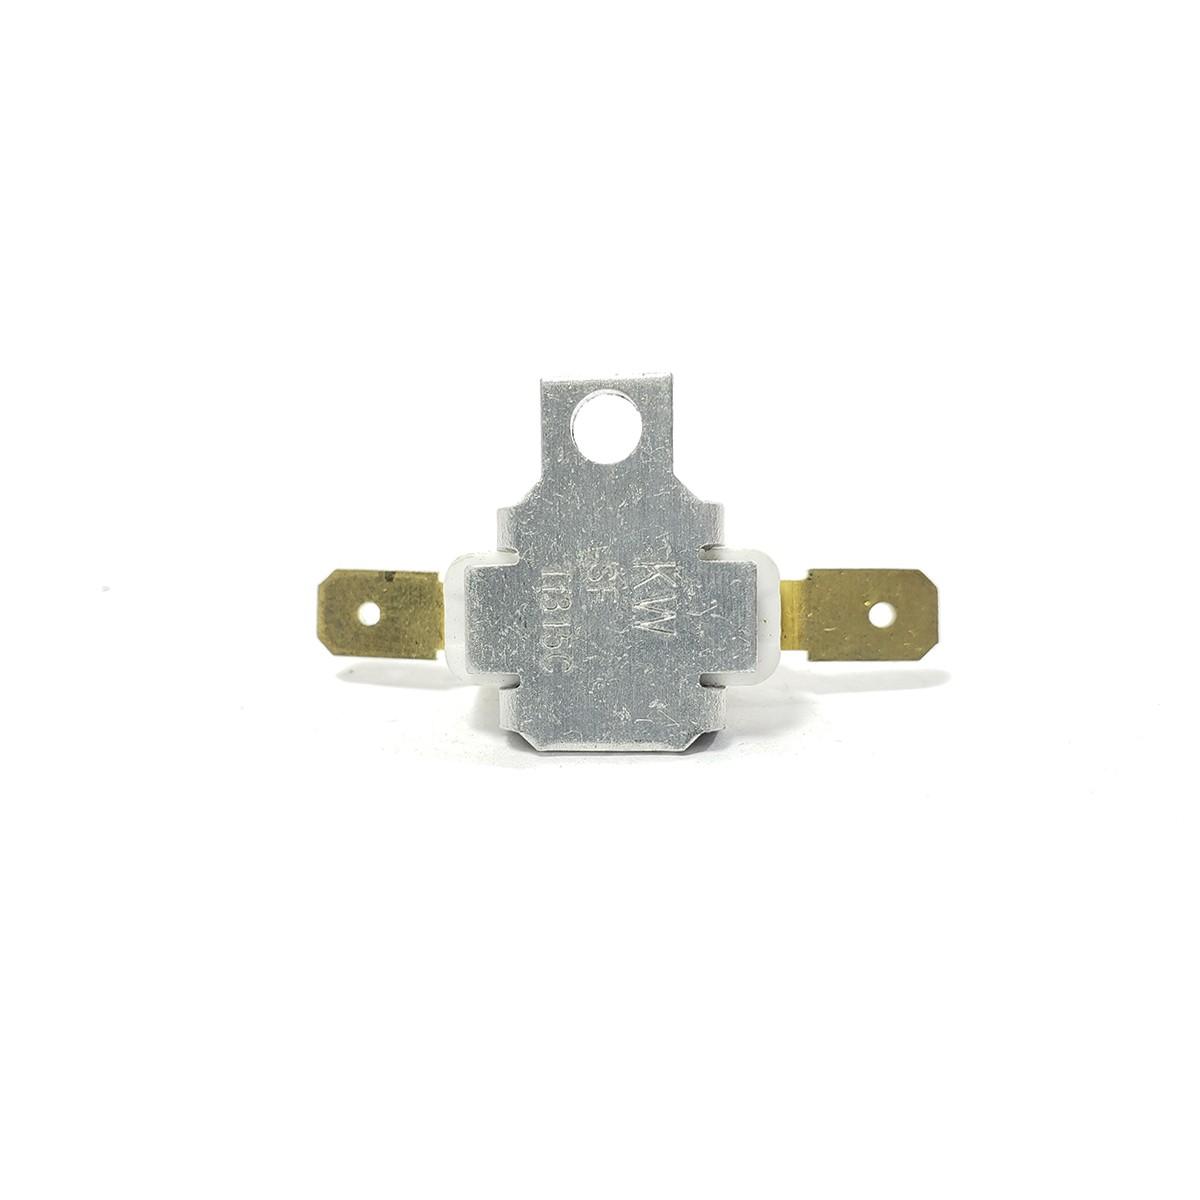 Fusível Térmico 250VAC/15A KW SF/Tf315c Para Ferro De Passar Electrolux - FE002017